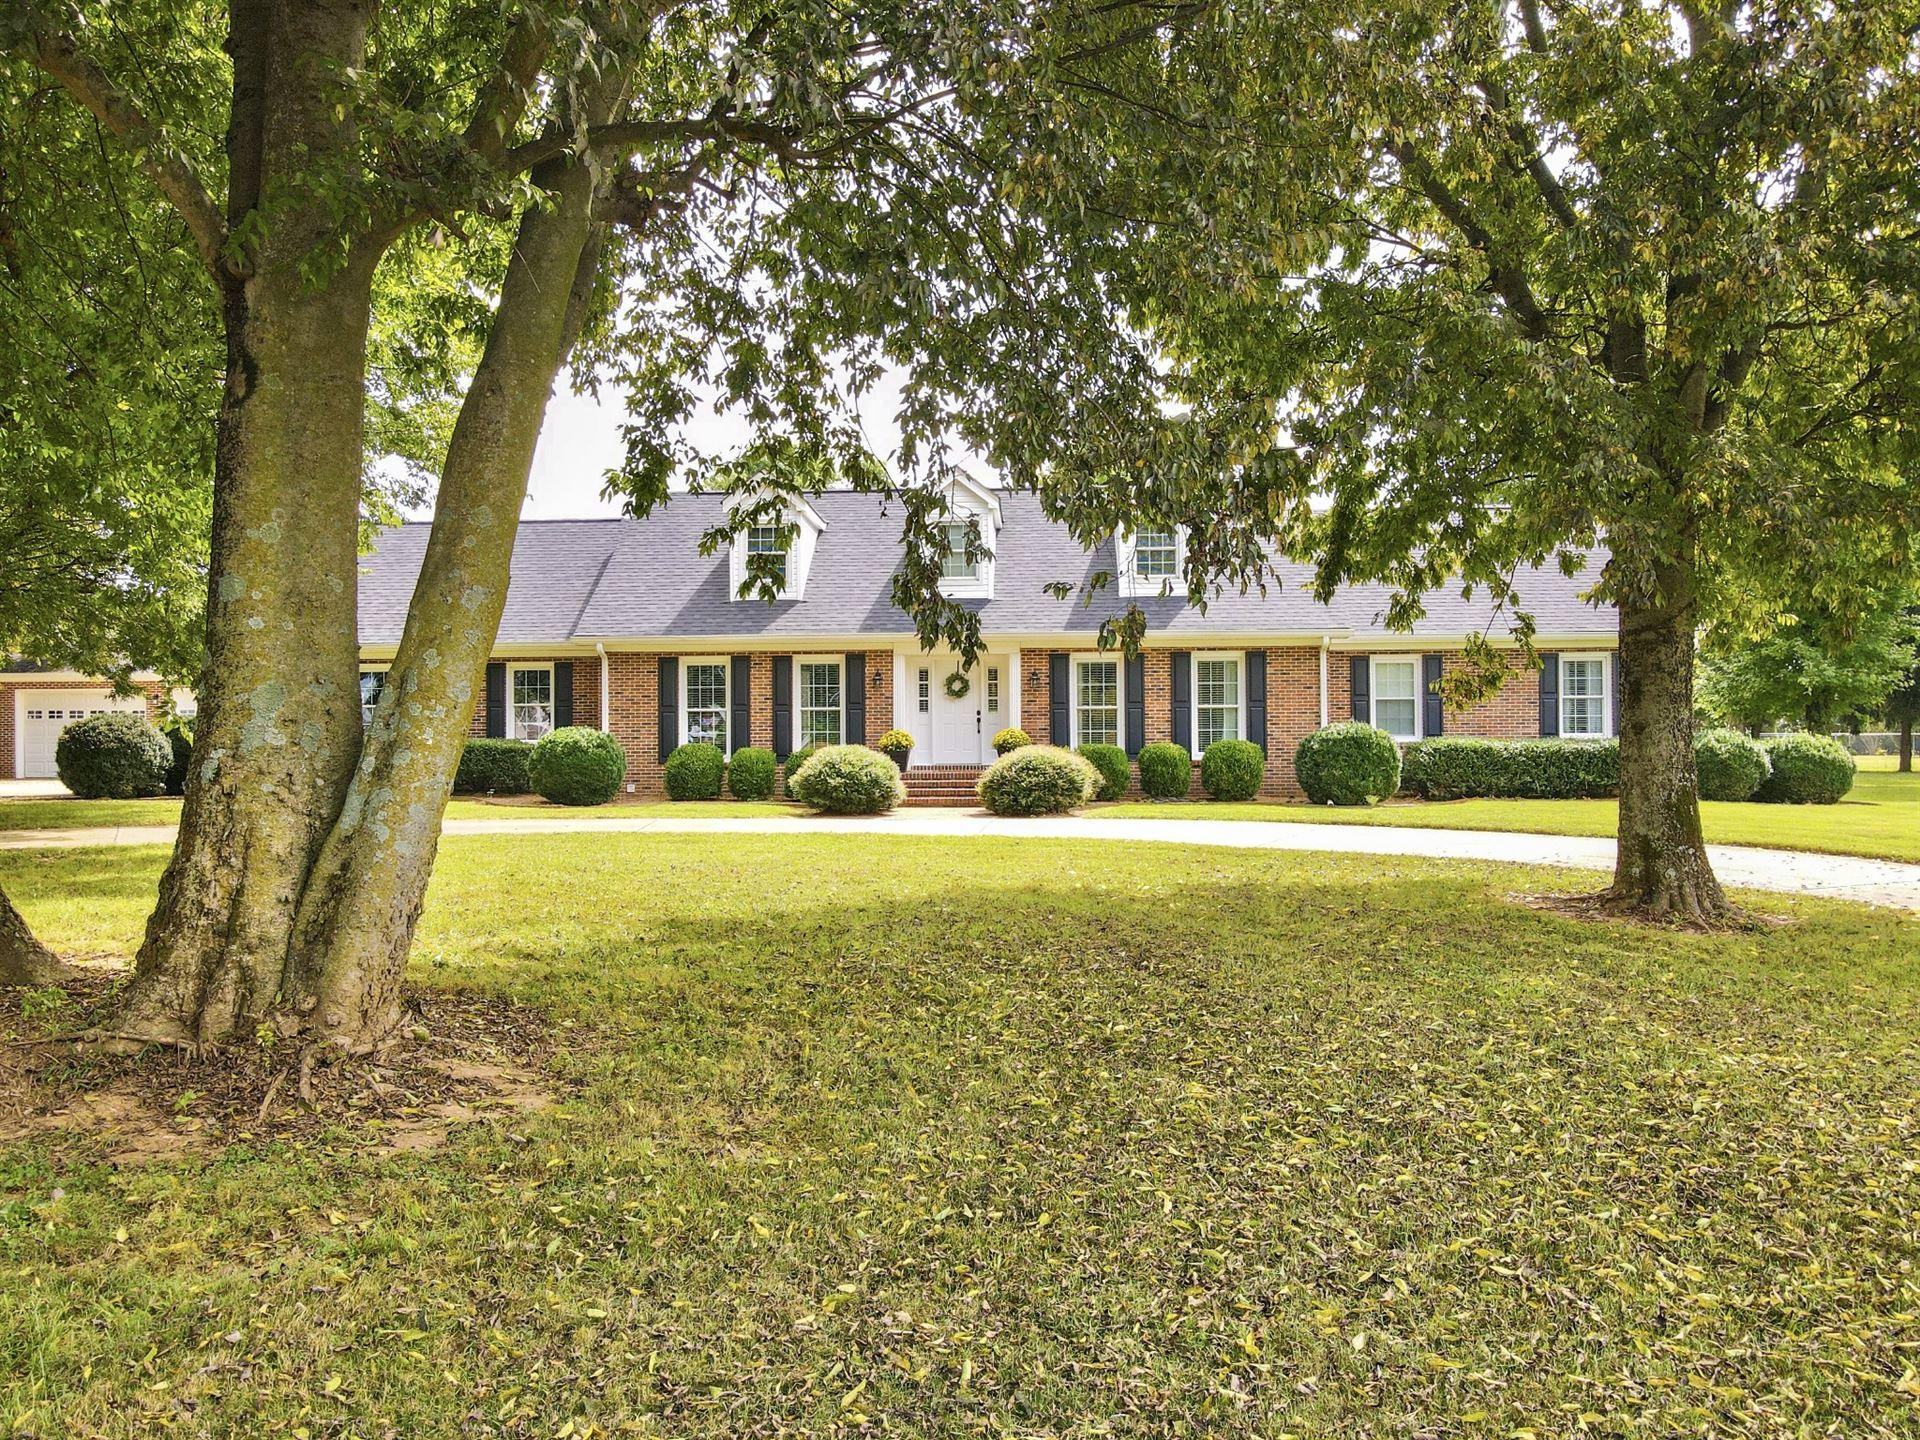 7115 Old Zion Rd, Columbia, TN 38401 - MLS#: 2292353